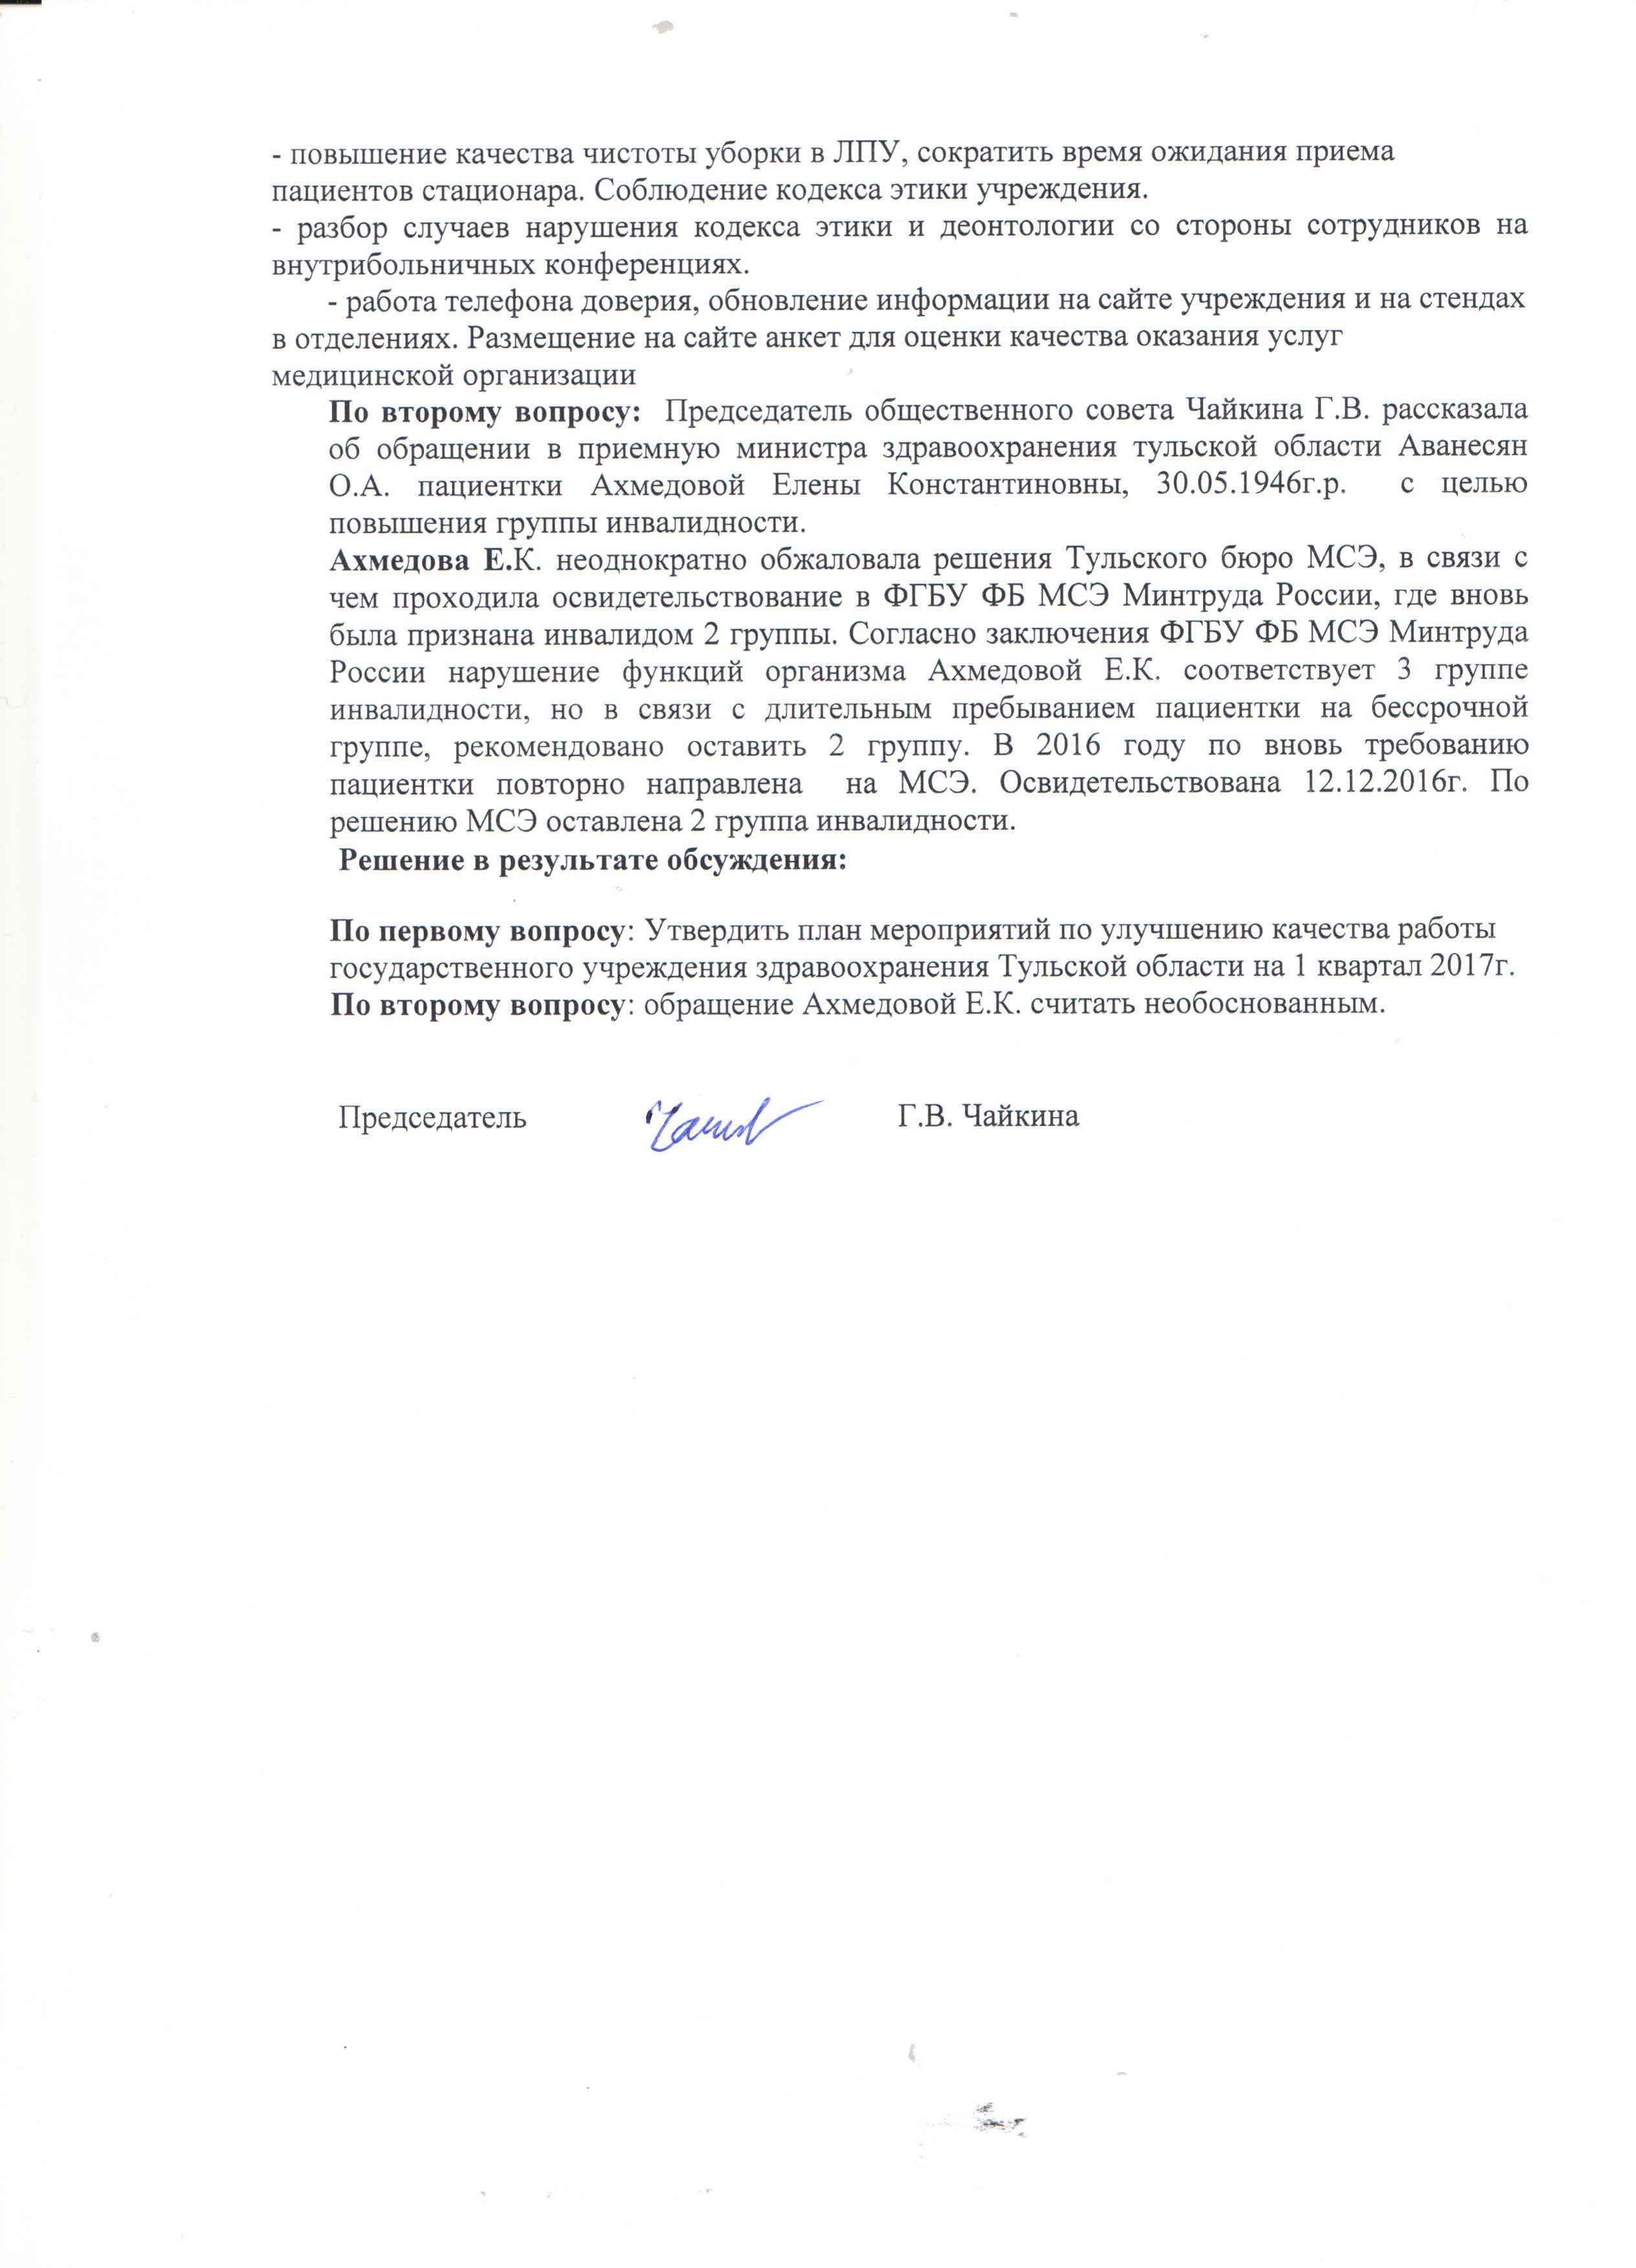 protocol february 2